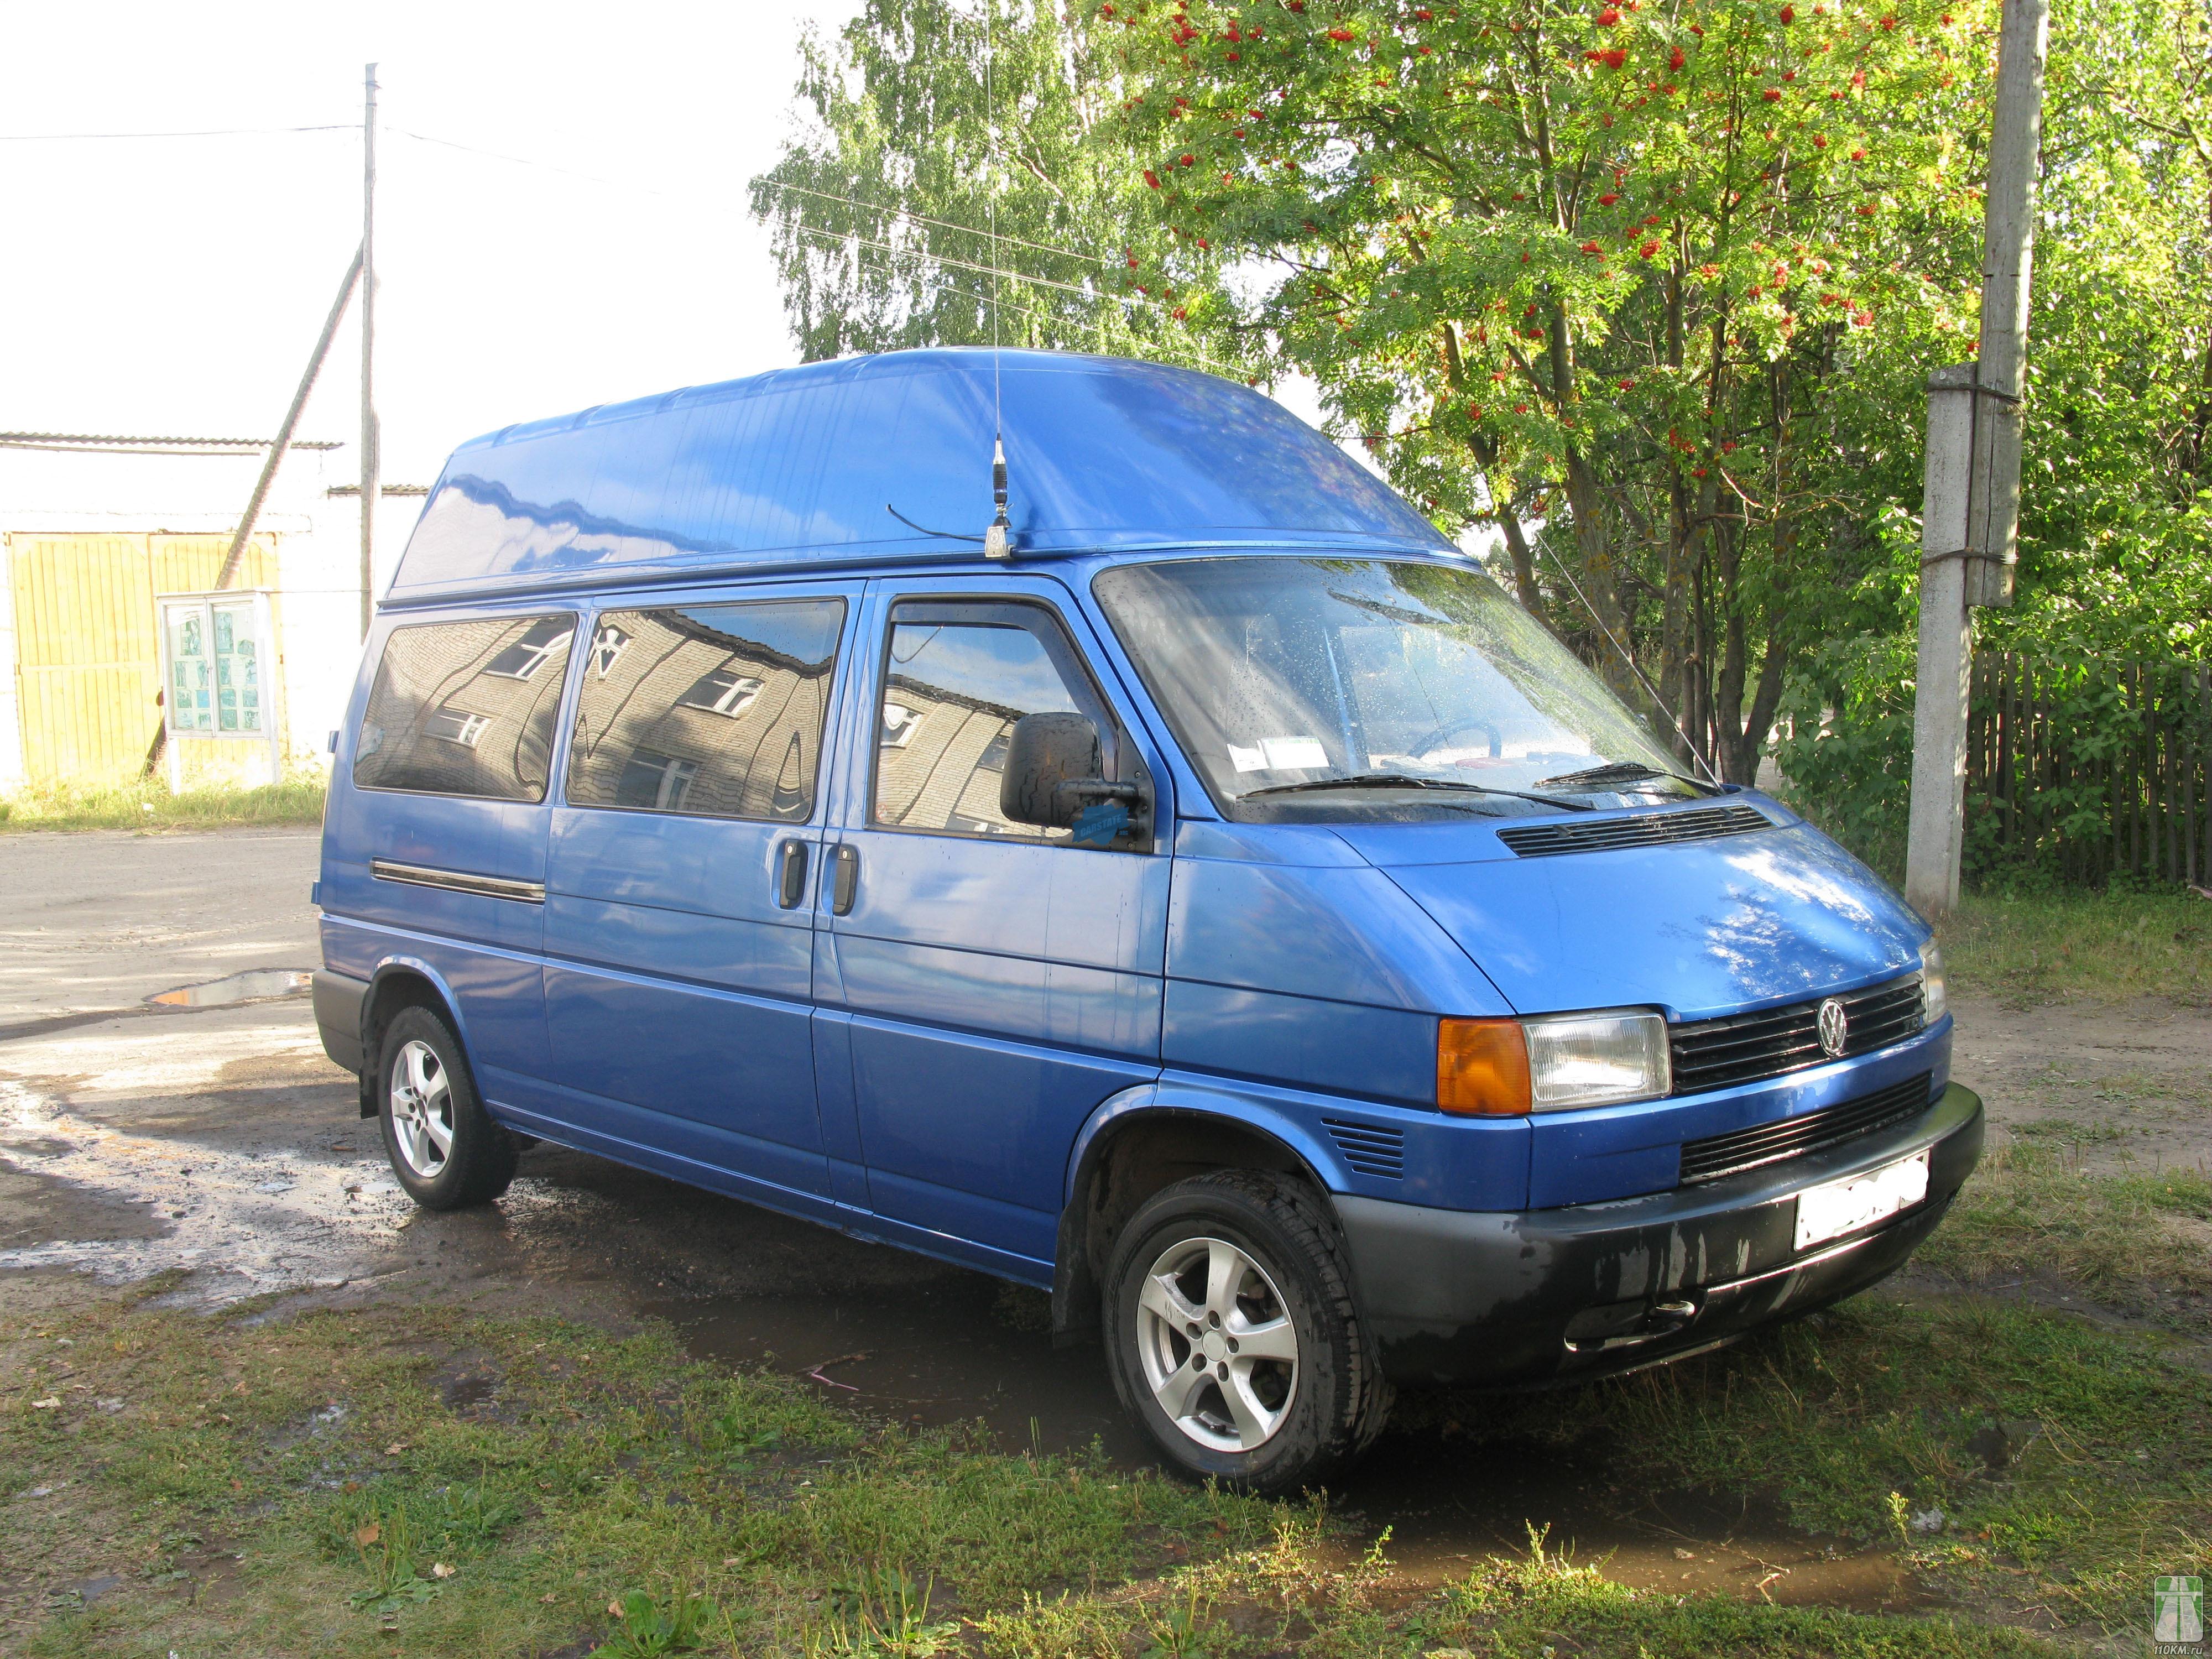 VW TRANSPORTER / CARAVELLE Mk IV автобус (70XB, 70XC, 7DB, 7DW)